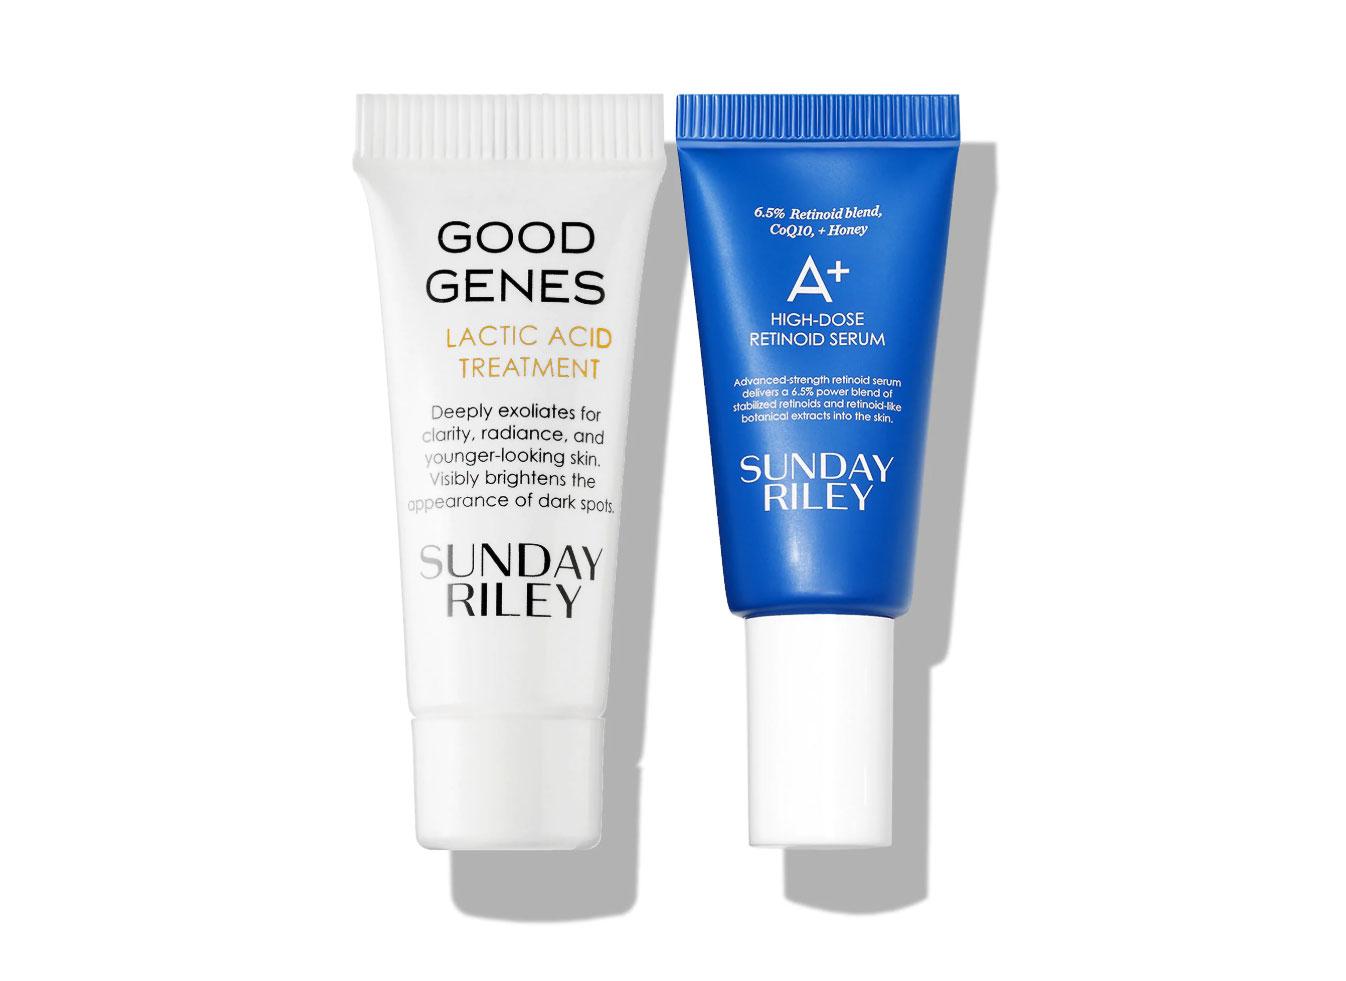 Sunday Riley Good Genes Treatment & A+ High-Dose Retinoid Serum